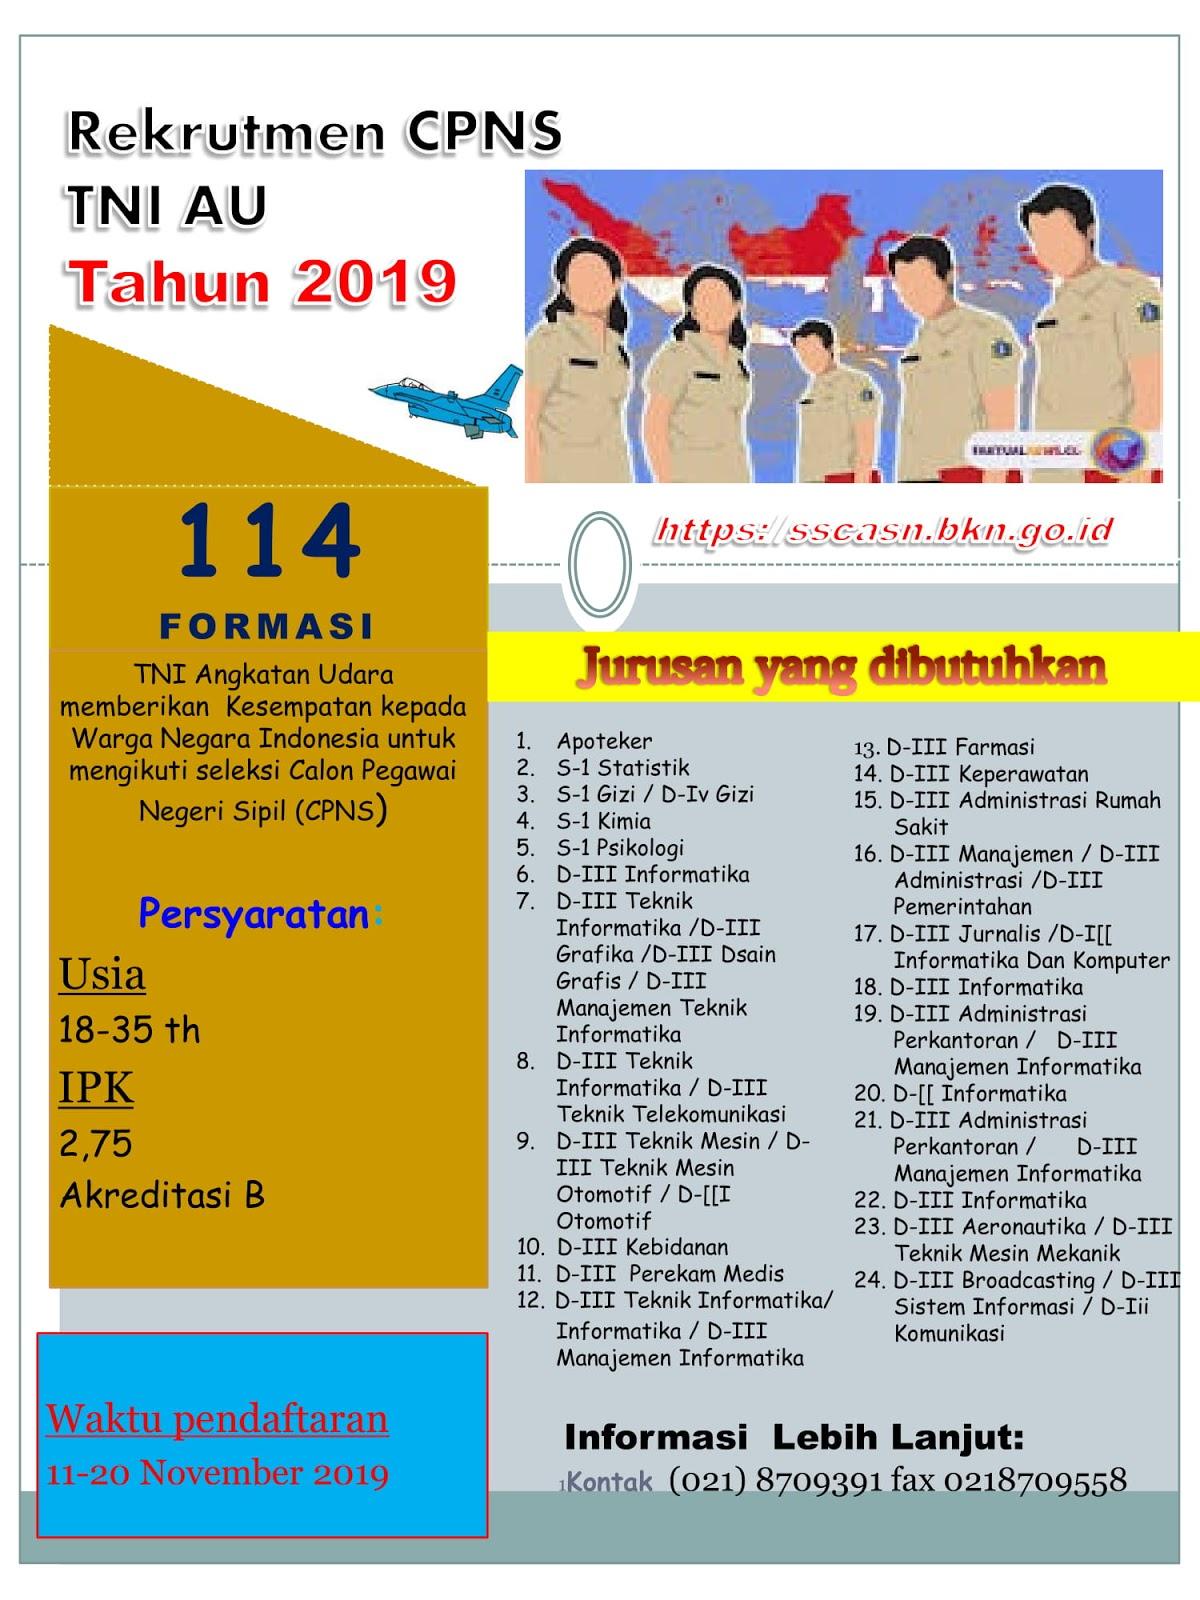 Rekrutmen CPNS TNI Angkatan Udara Tahun 2019 [114 Formasi]